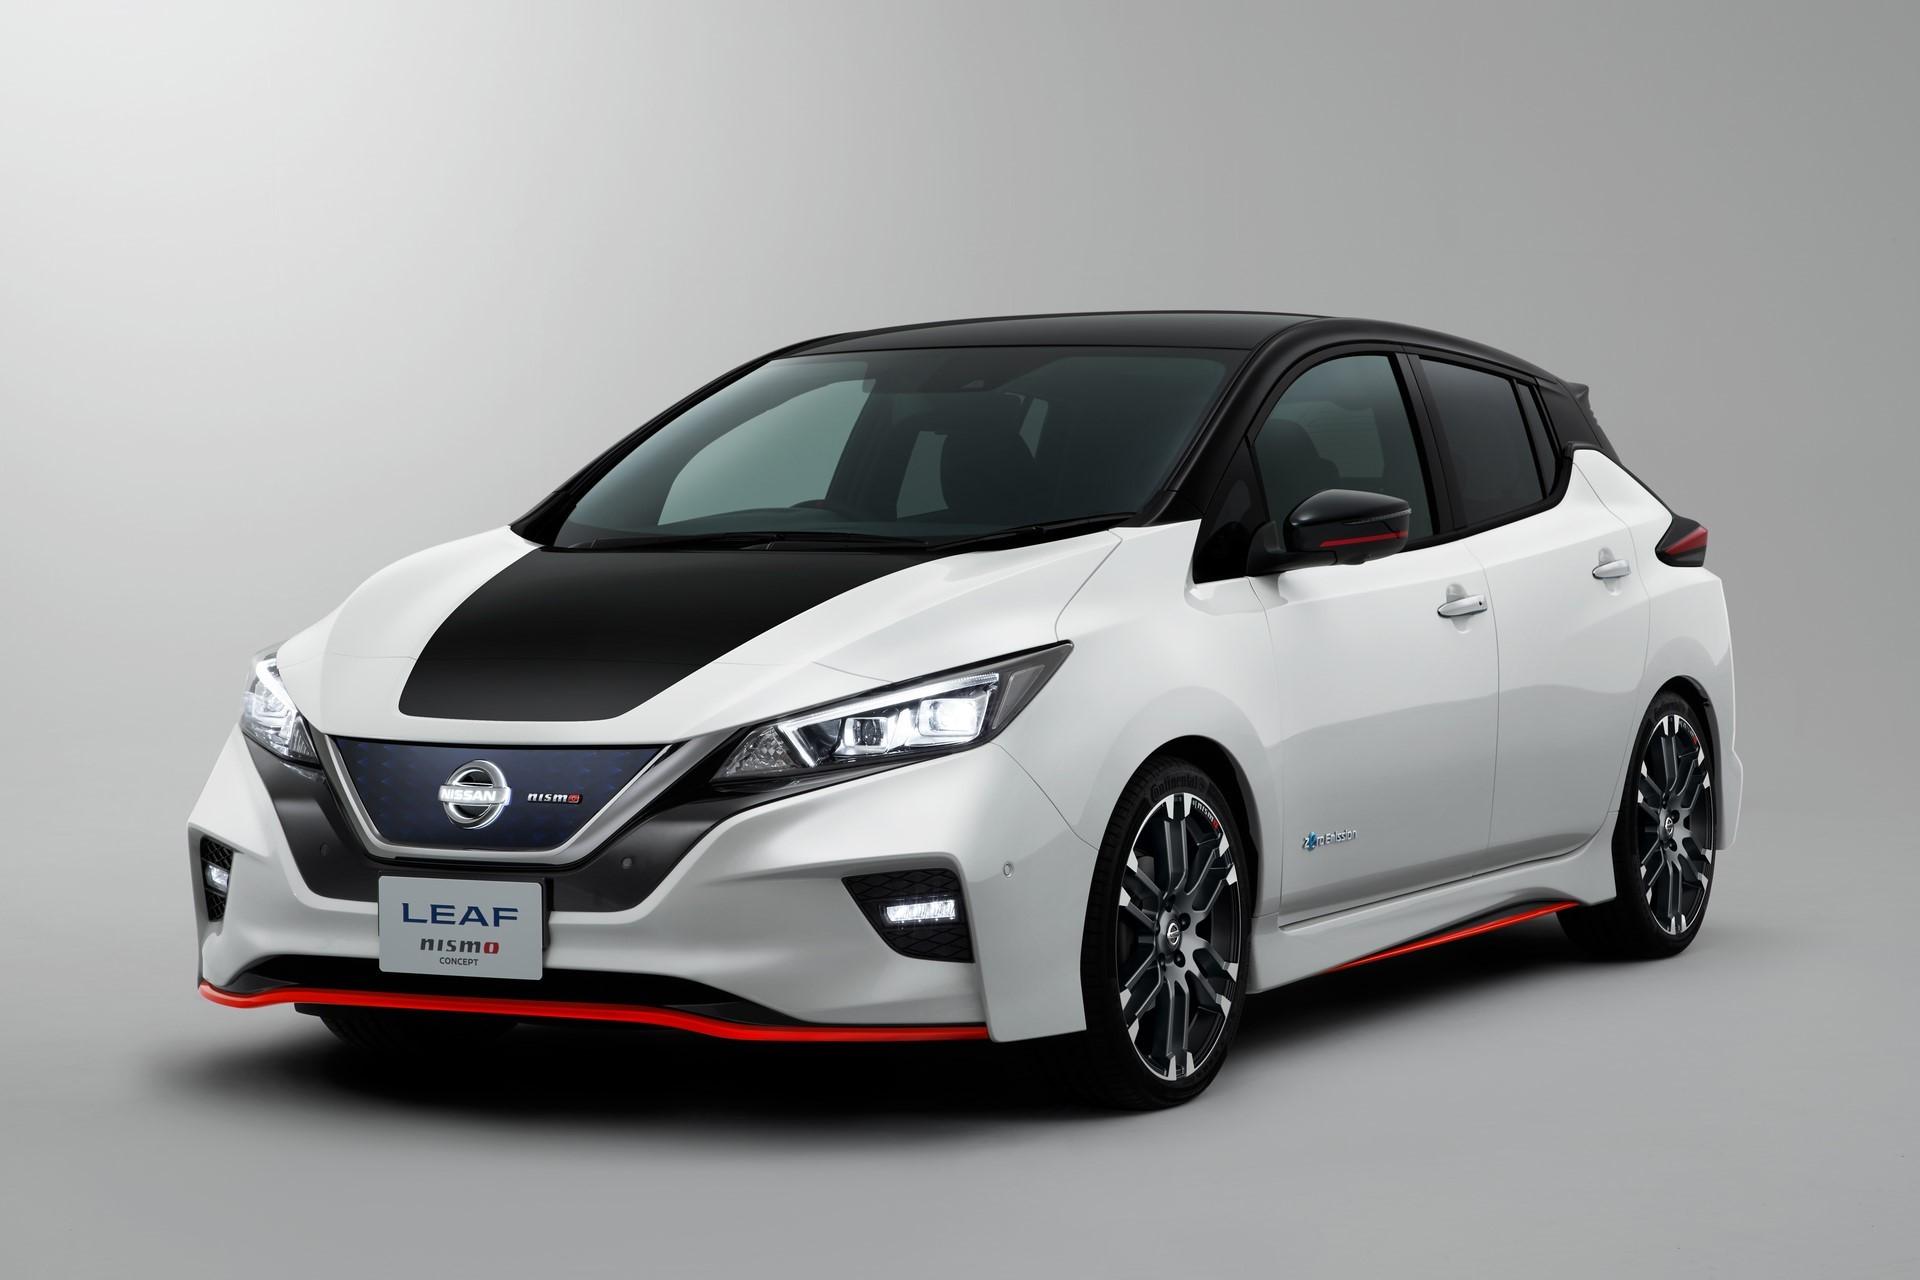 Nissan Leaf Nismo Concep (2)